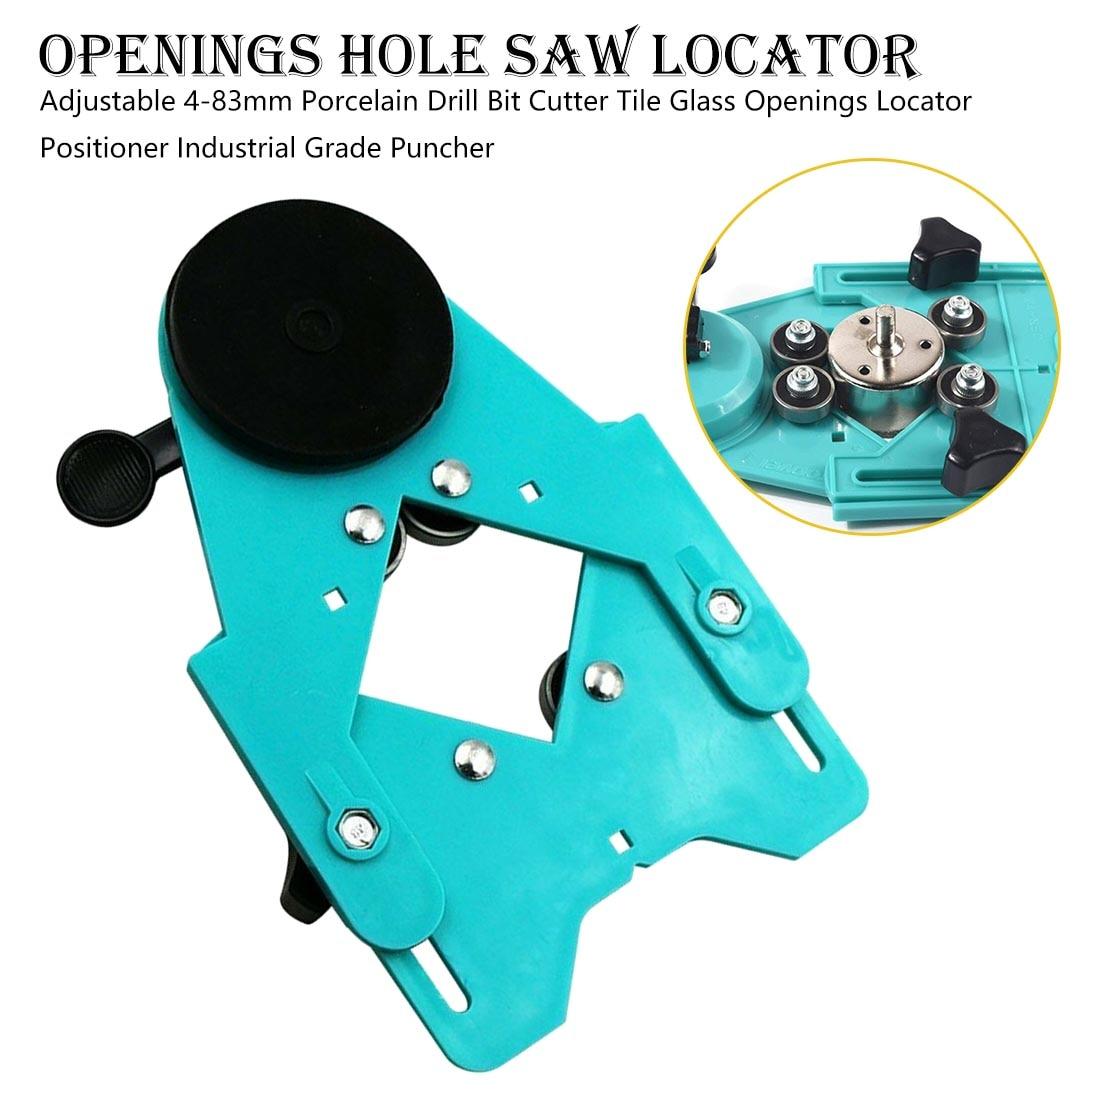 Pocket Hole Jig 4-83mm Porcelain Drill Bit Cutter Tile Glass Openings Locator Positioner Industrial Grade Puncher Corner Clamp